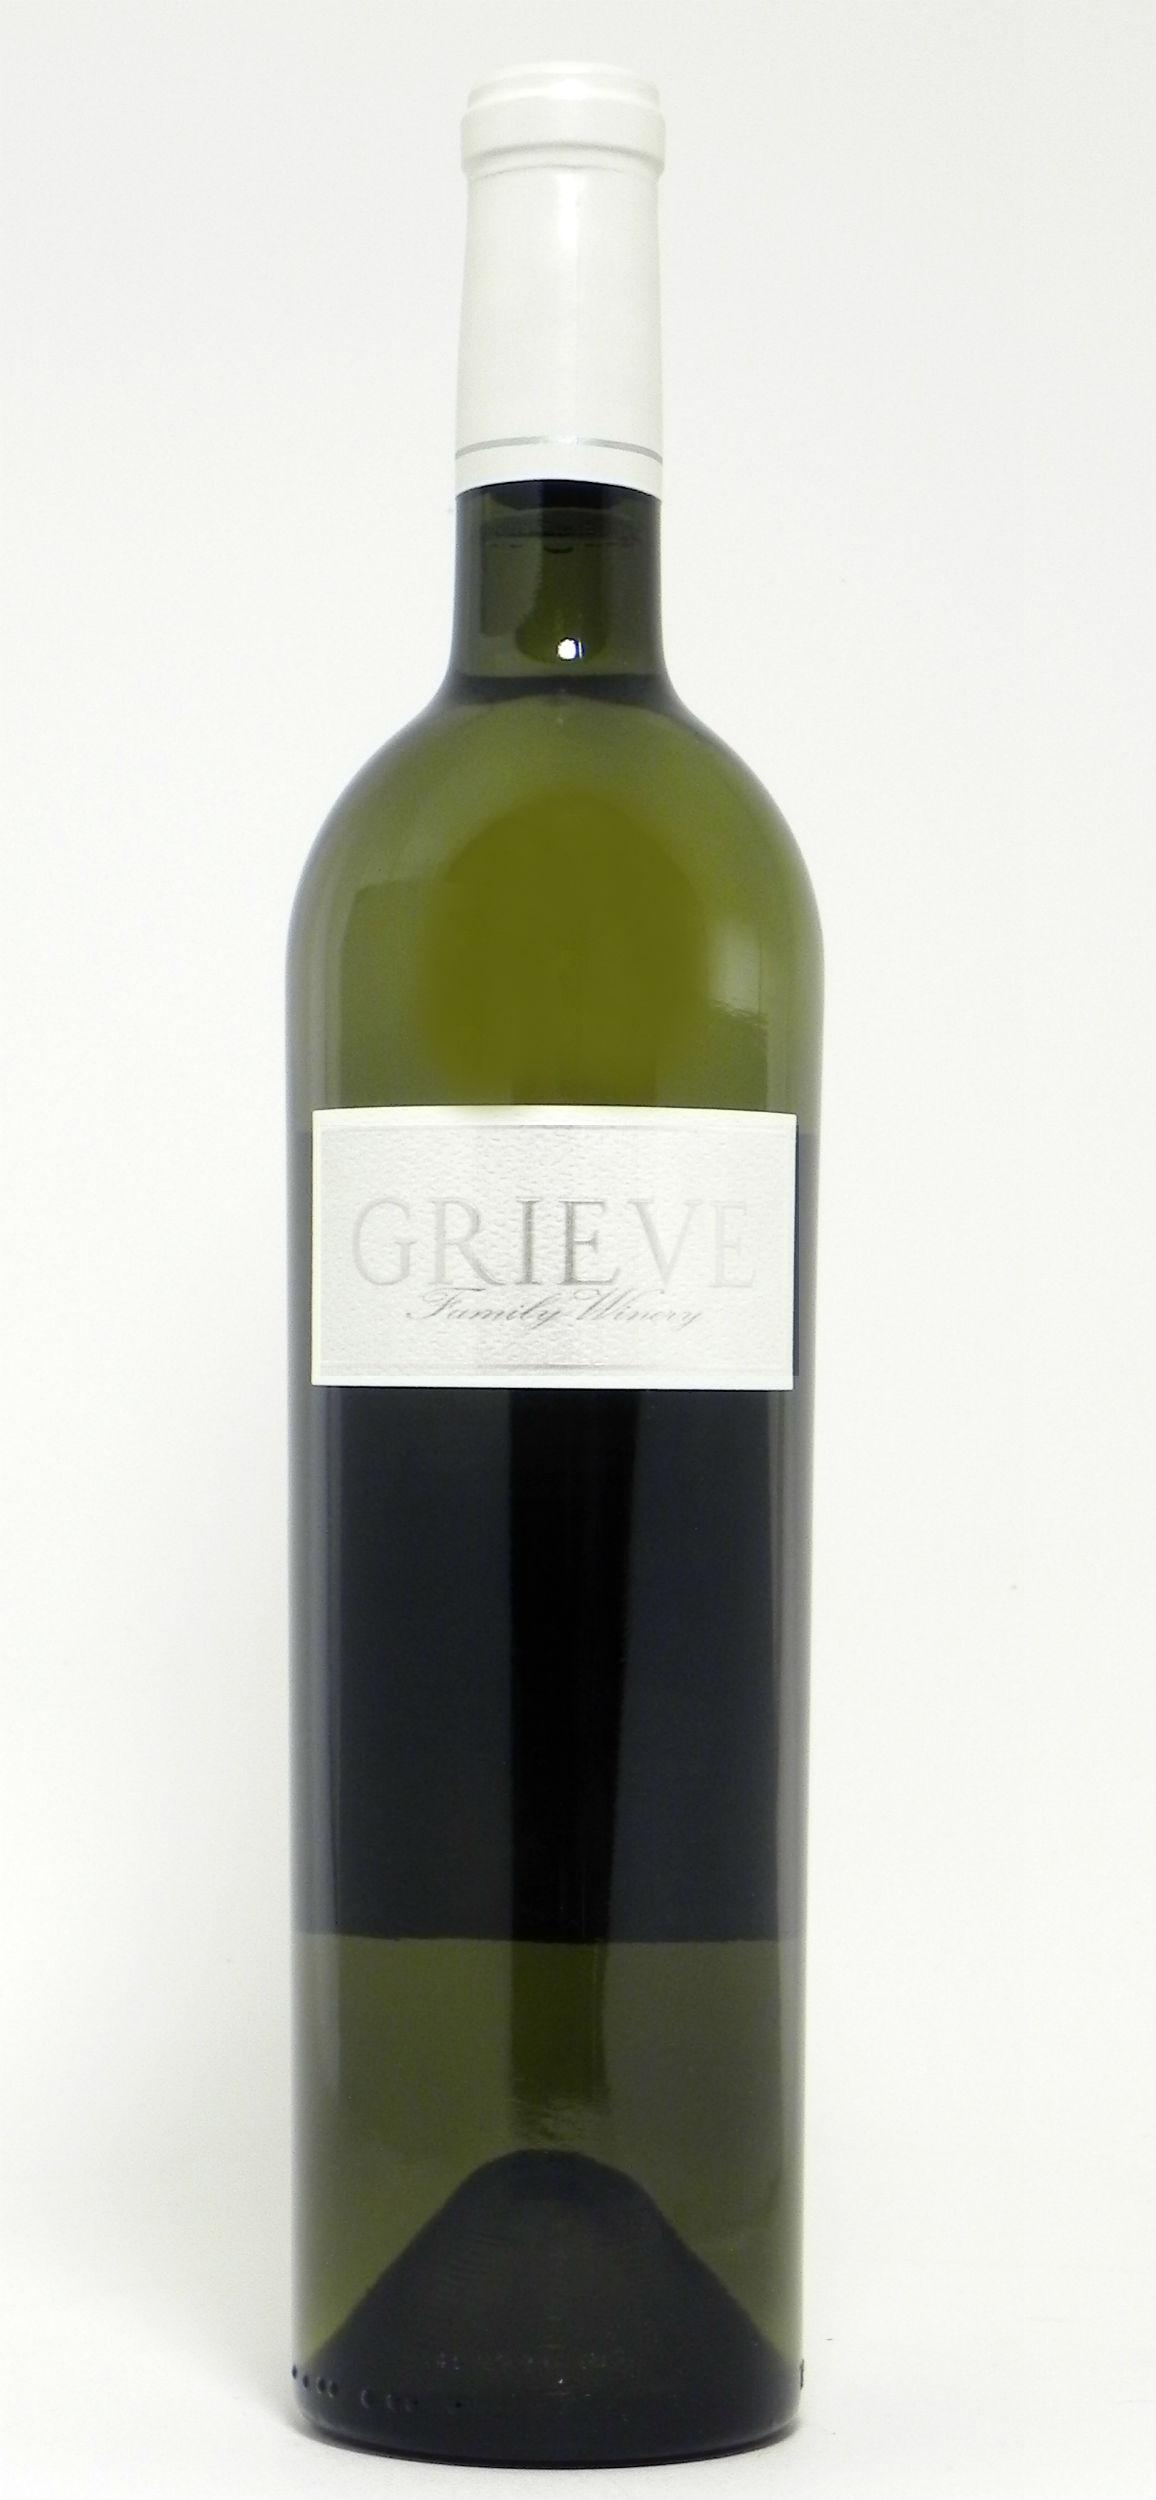 2010 Grieve Sauvignon Blanc